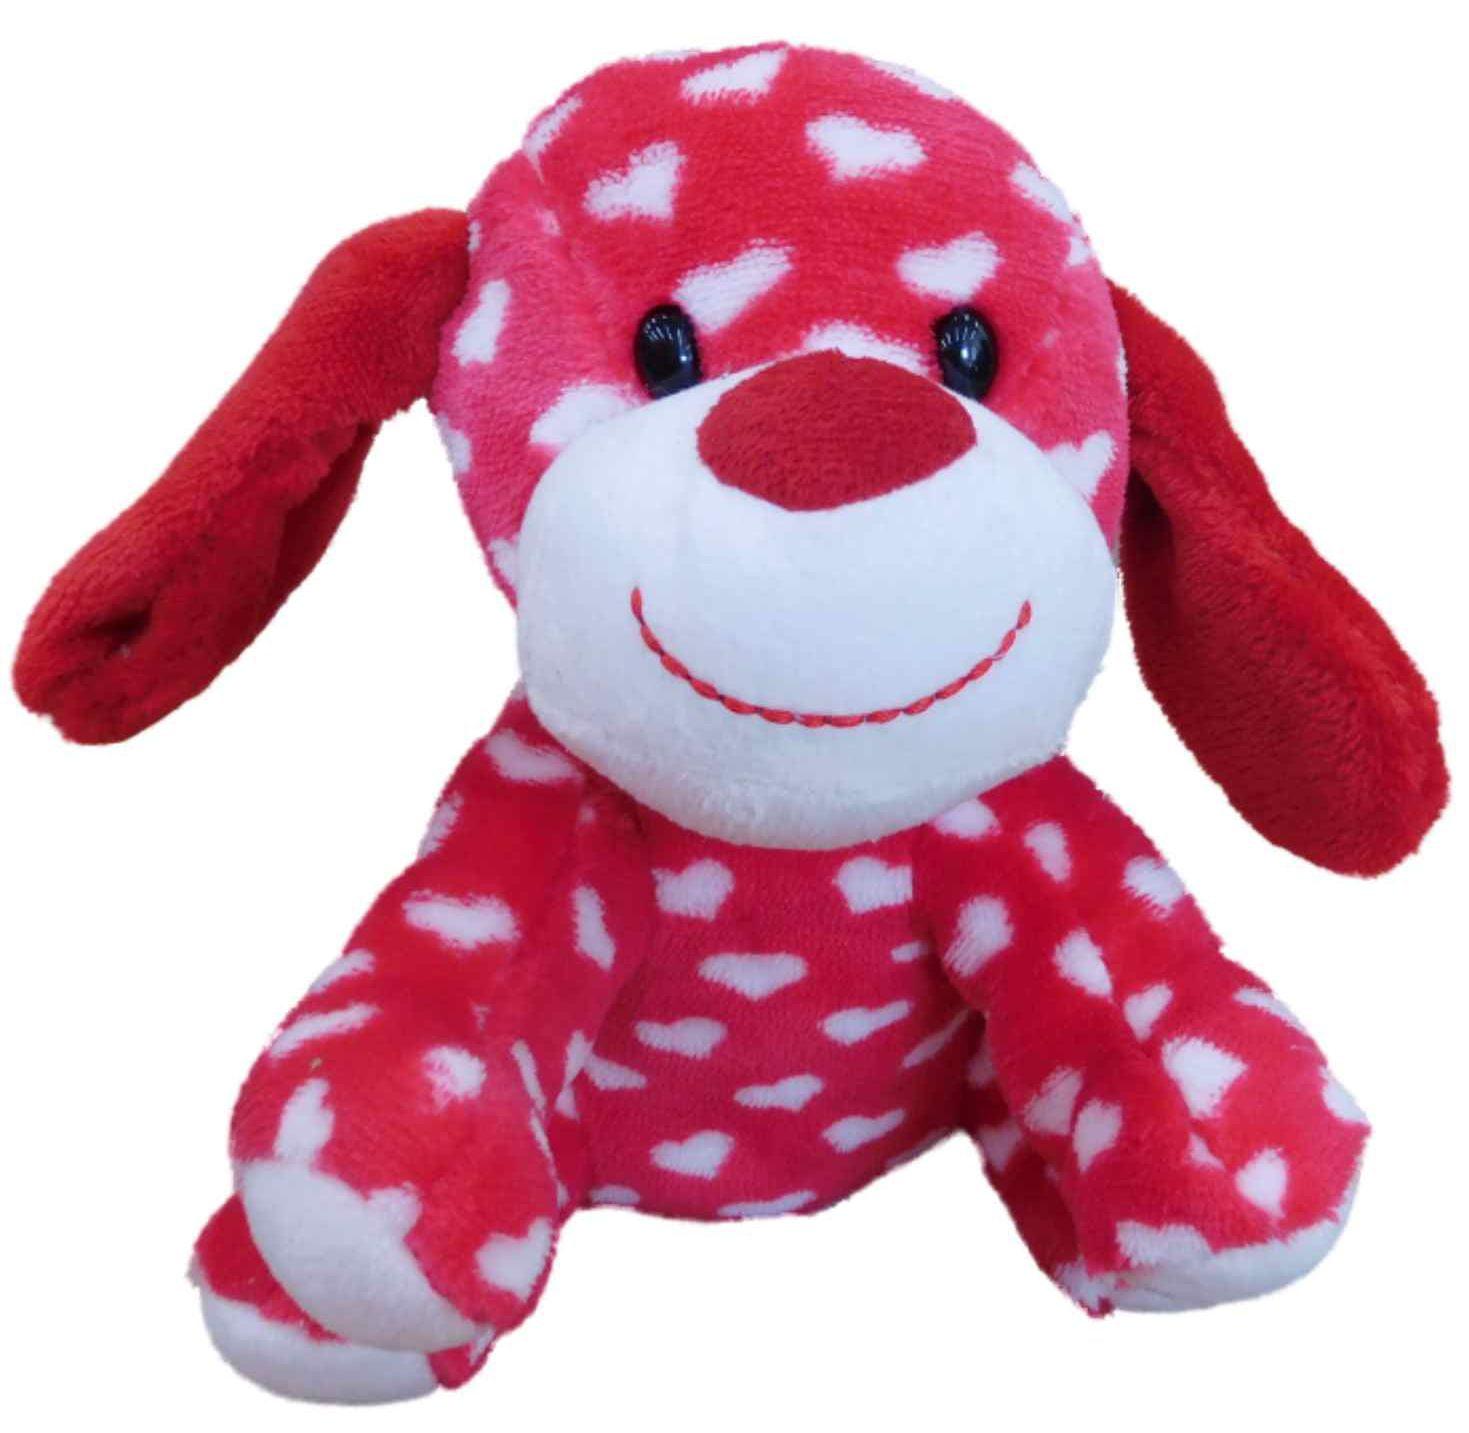 Celebrate Plush Puppy Dog Stuffed Animal Valentine 7 Red Heart Pup